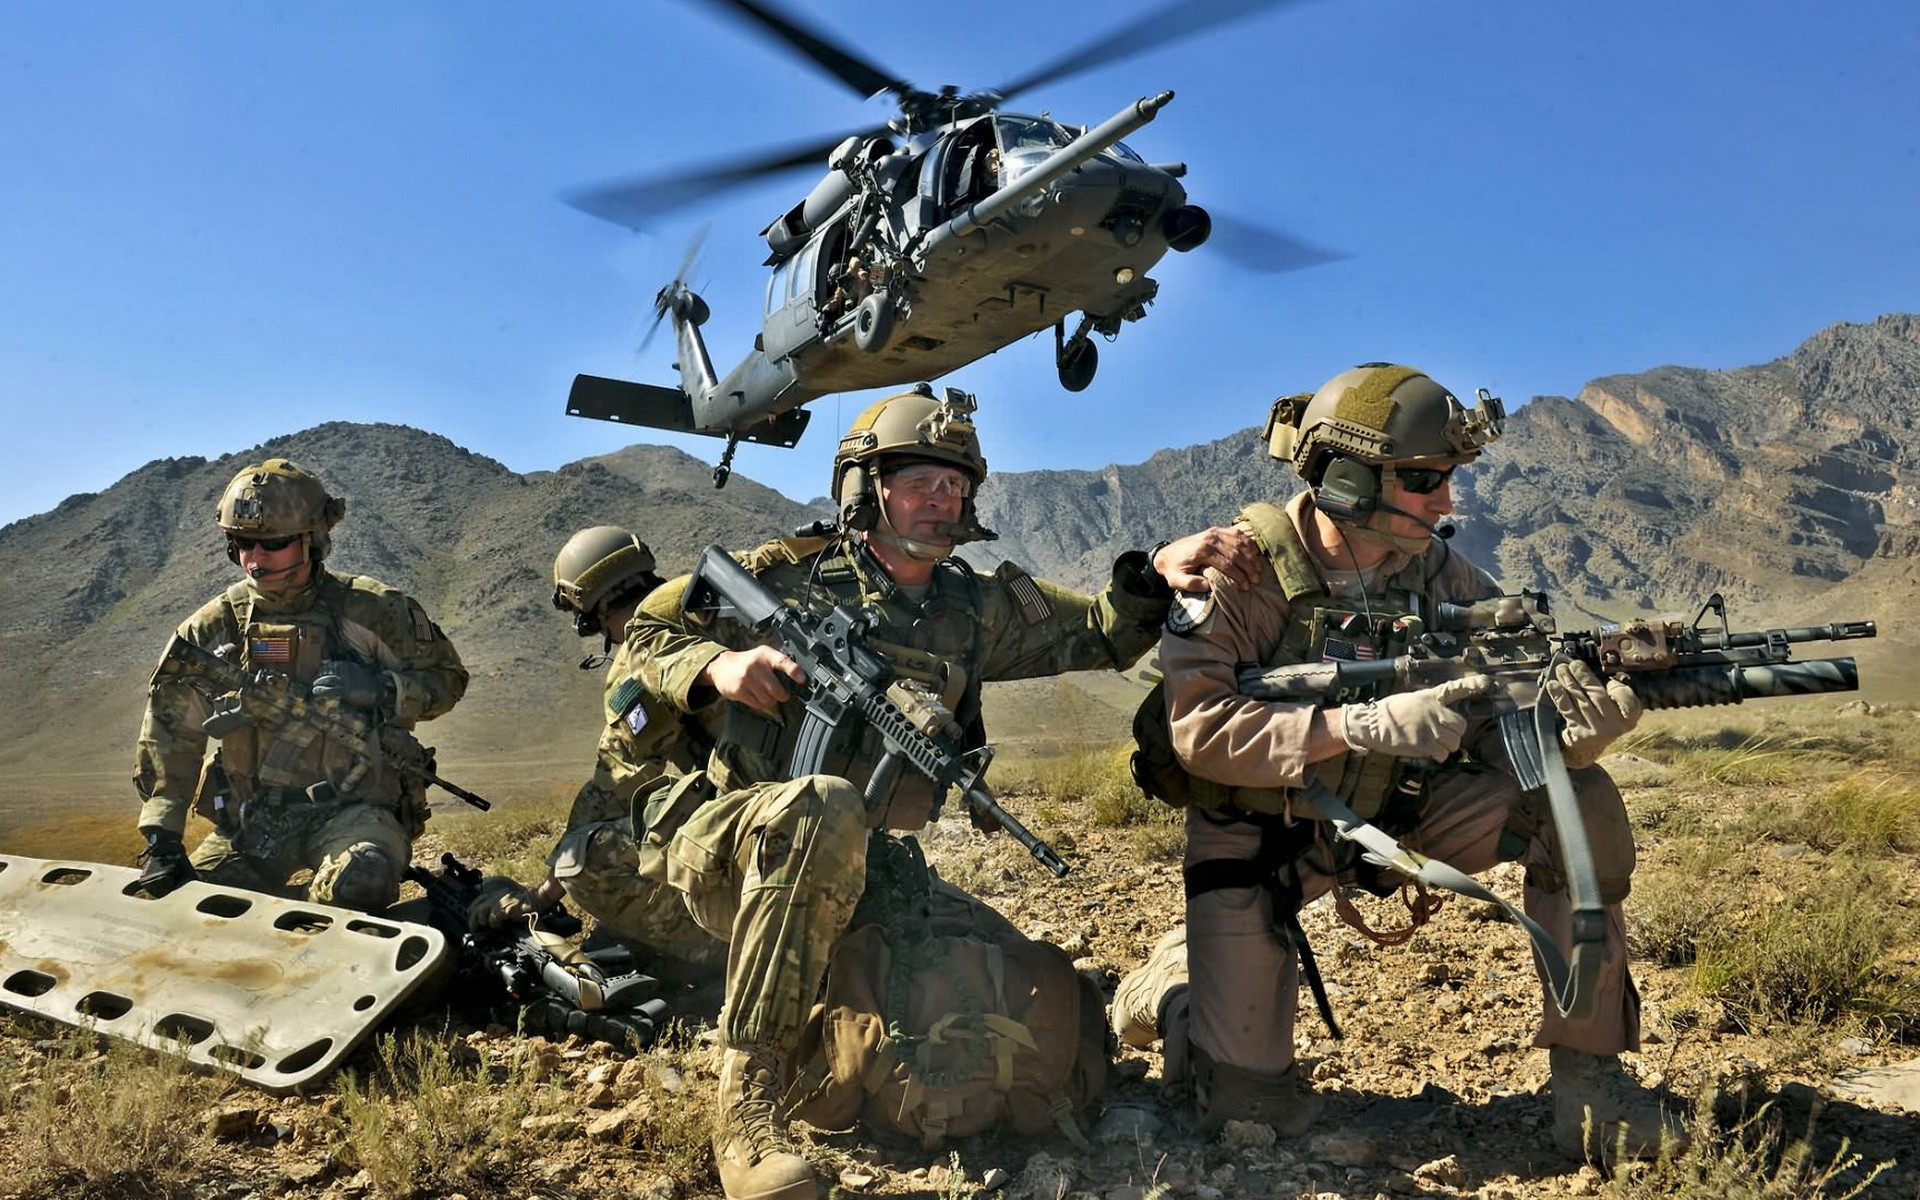 Download Army Wallpaper 1920x1200 Wallpoper 383650 1920x1200